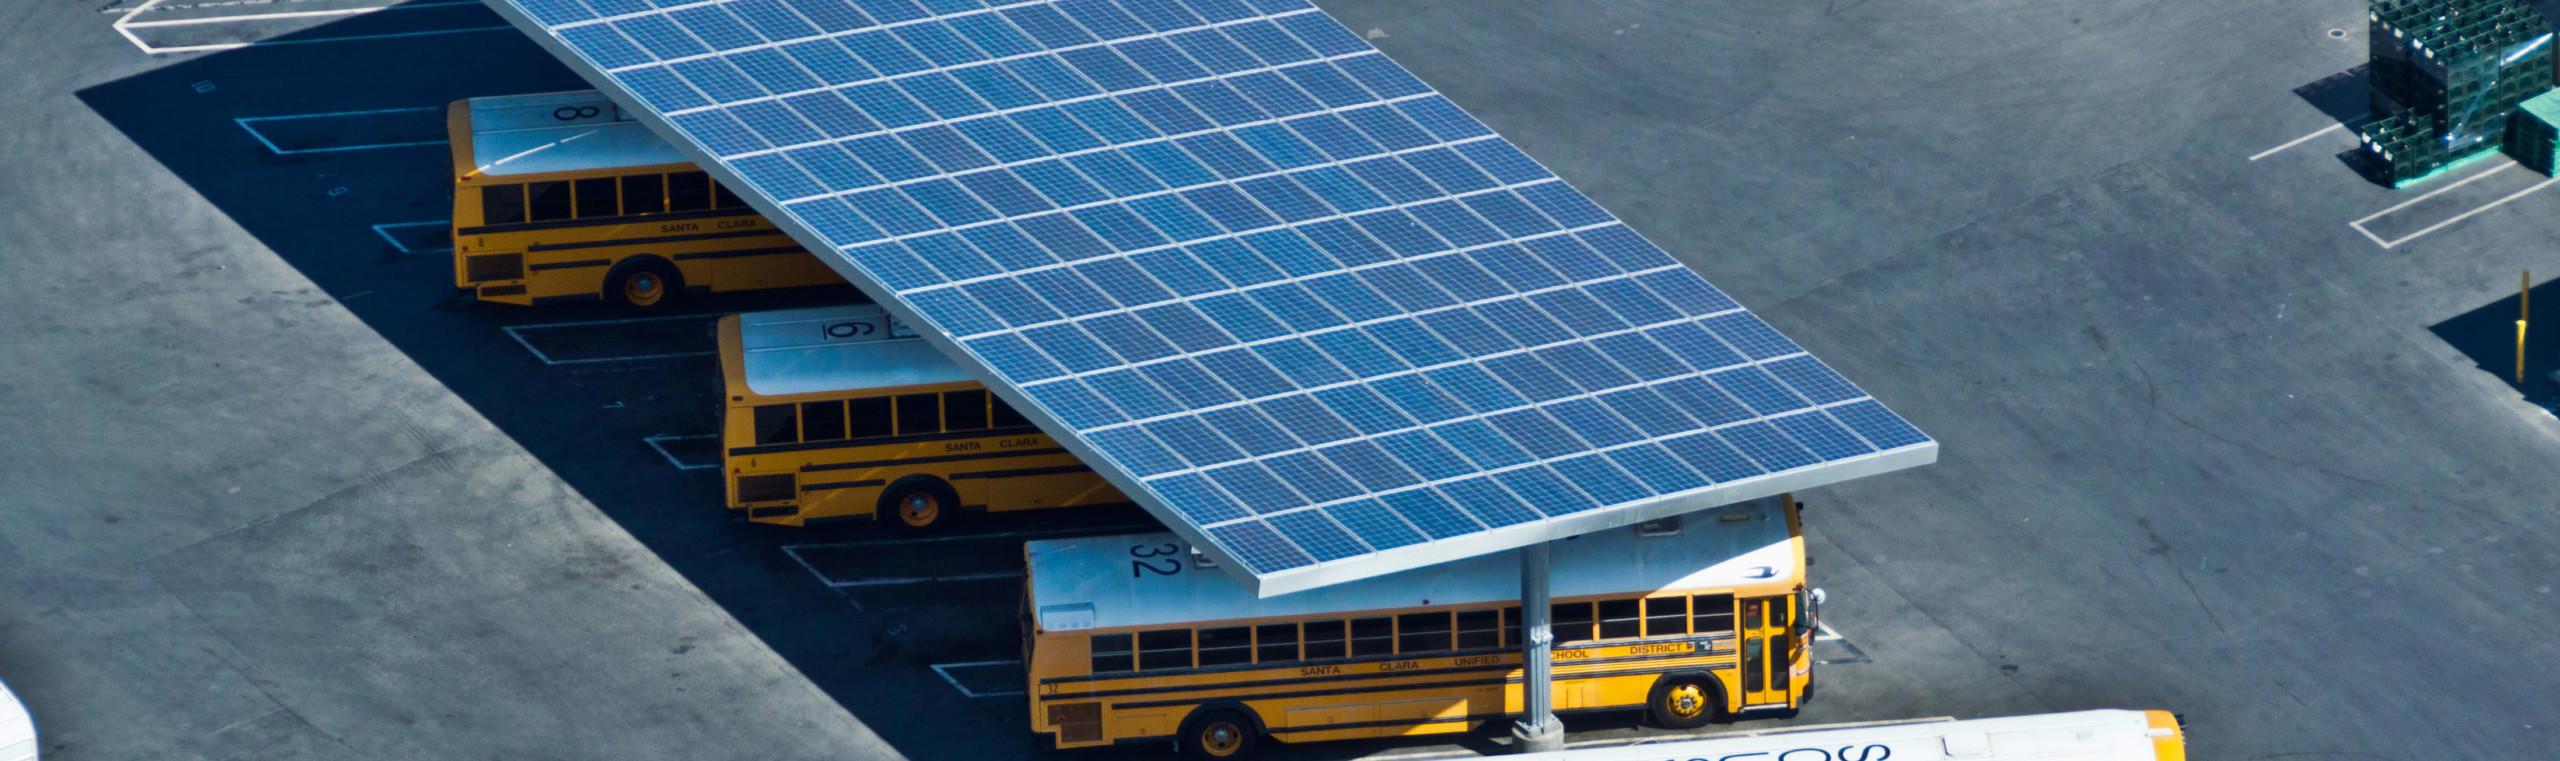 Solar Schools